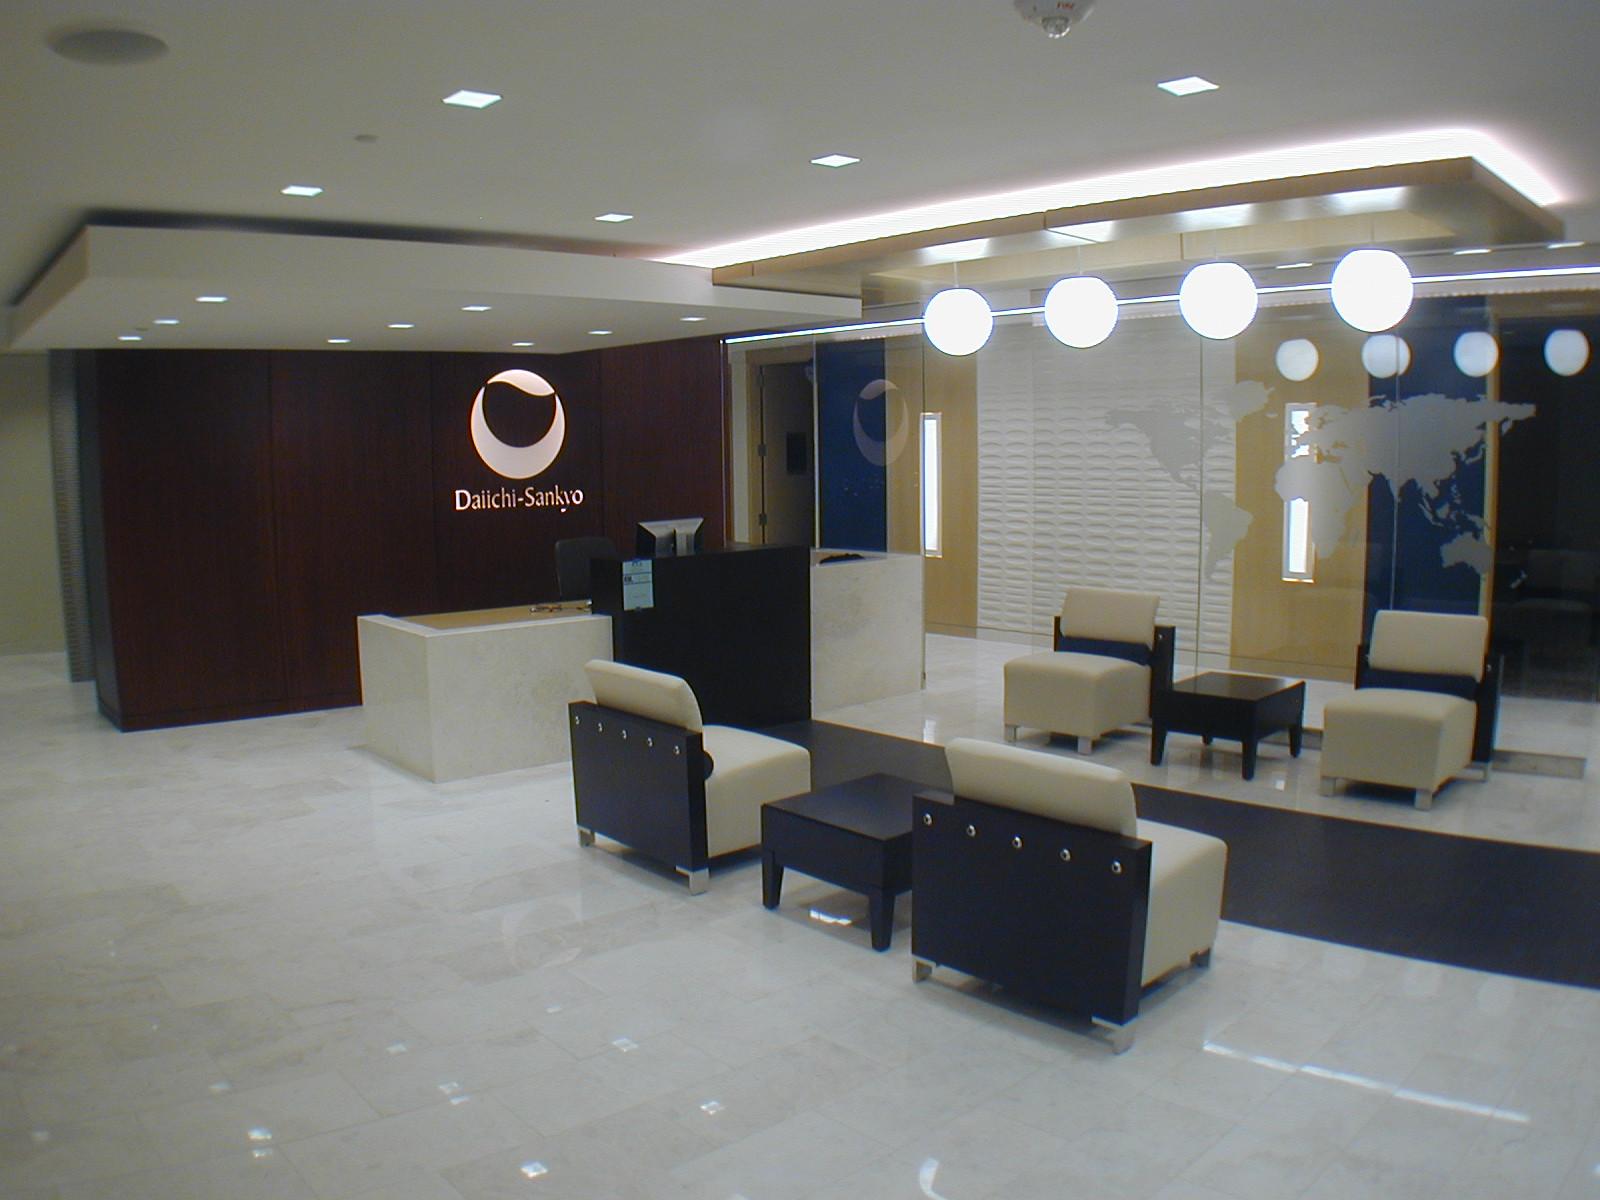 m_projects_0- Old Jobs_Daiichi Sankyo_Pics_P1010146.JPG